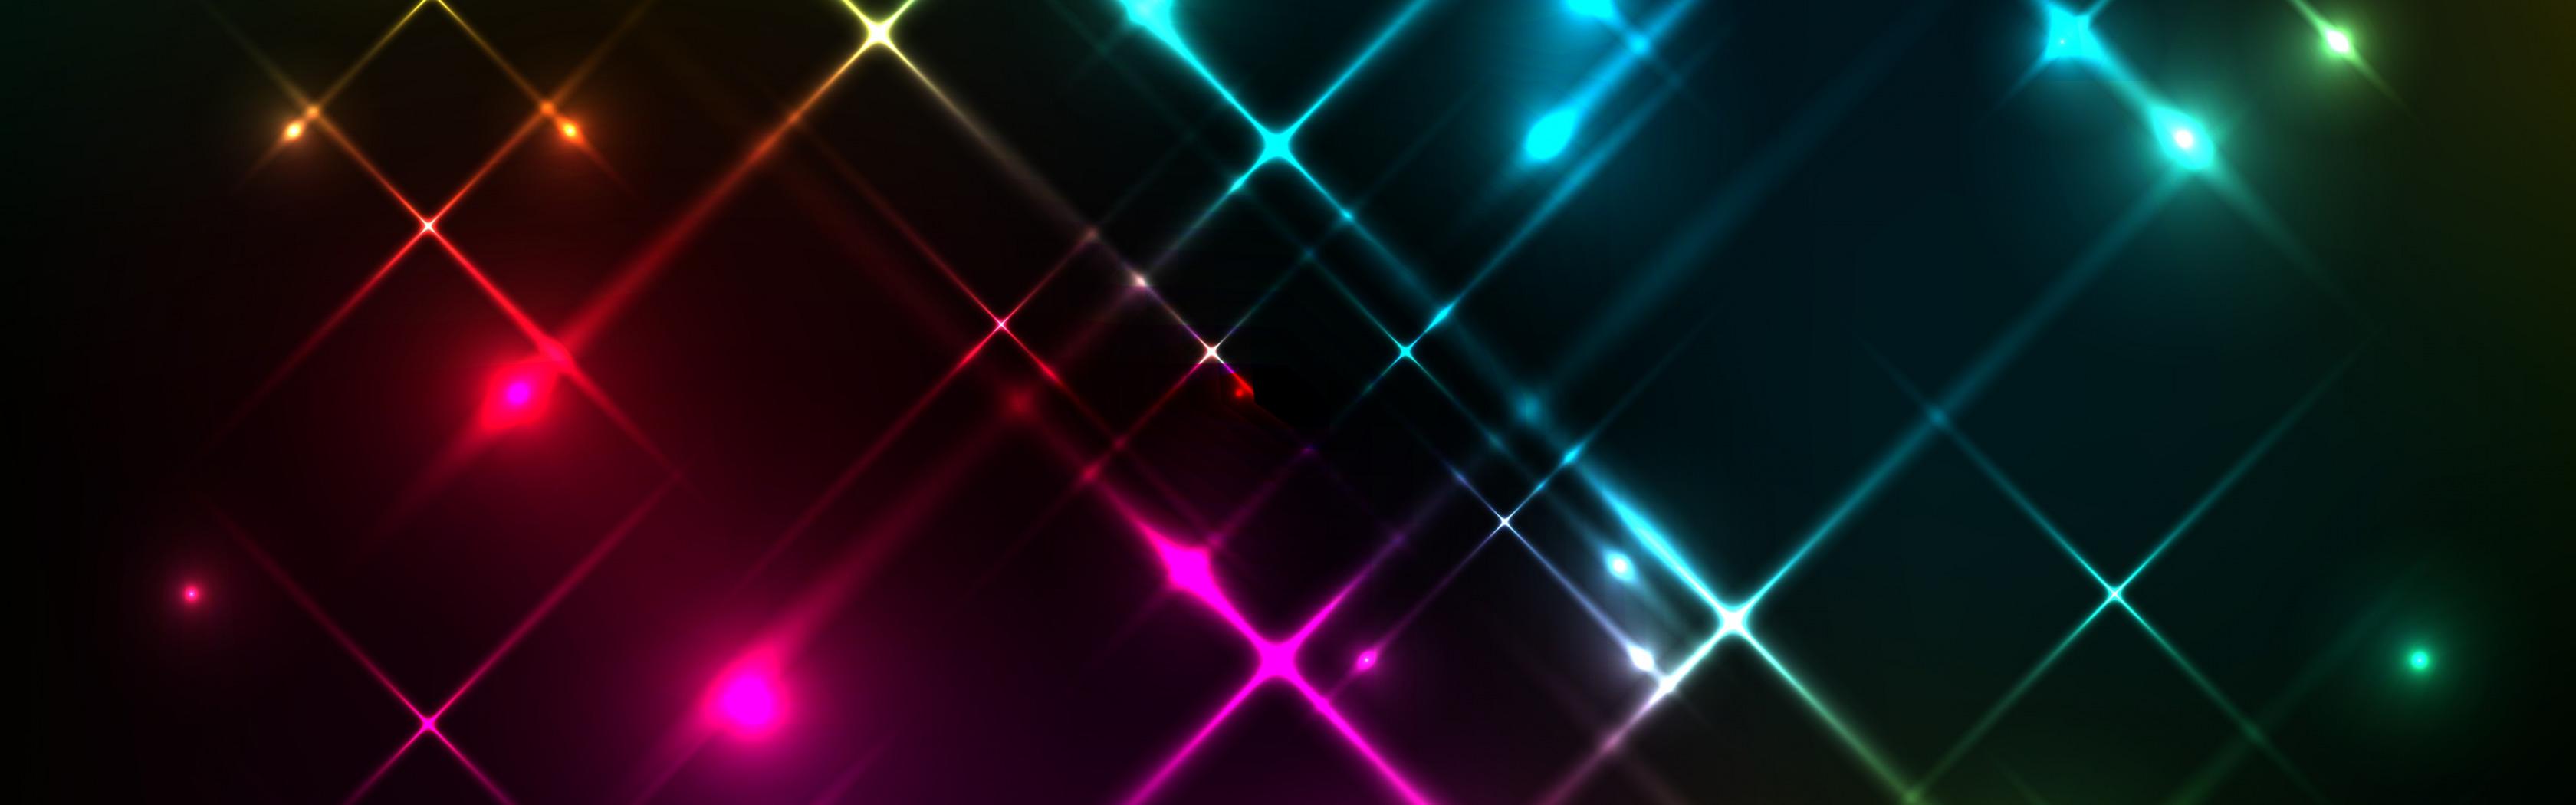 Обои неоновый, Abstract, rainbow, lights, colors, background. Абстракции foto 12